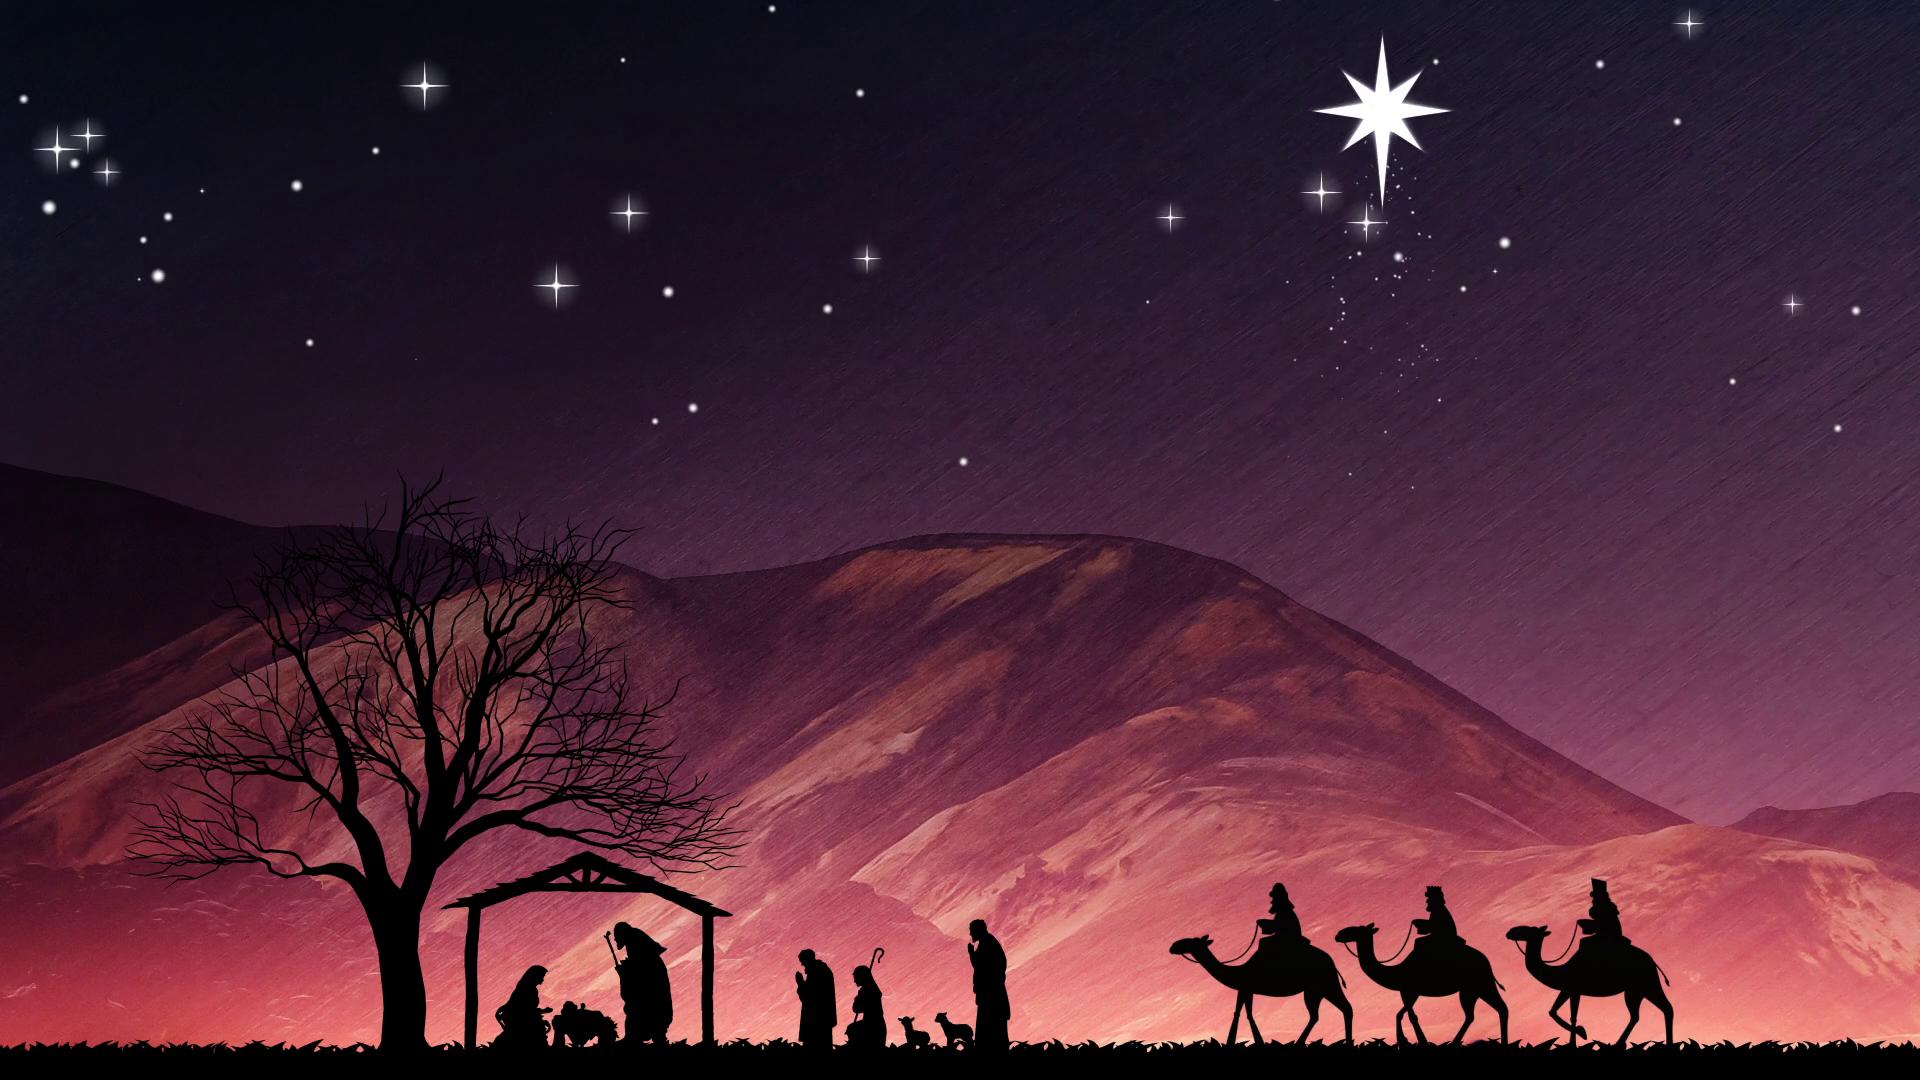 christmas-nativity-scene-shepherds-wise-me-and-large-bethlehem-star_rb-uzogme_thumbnail-full01